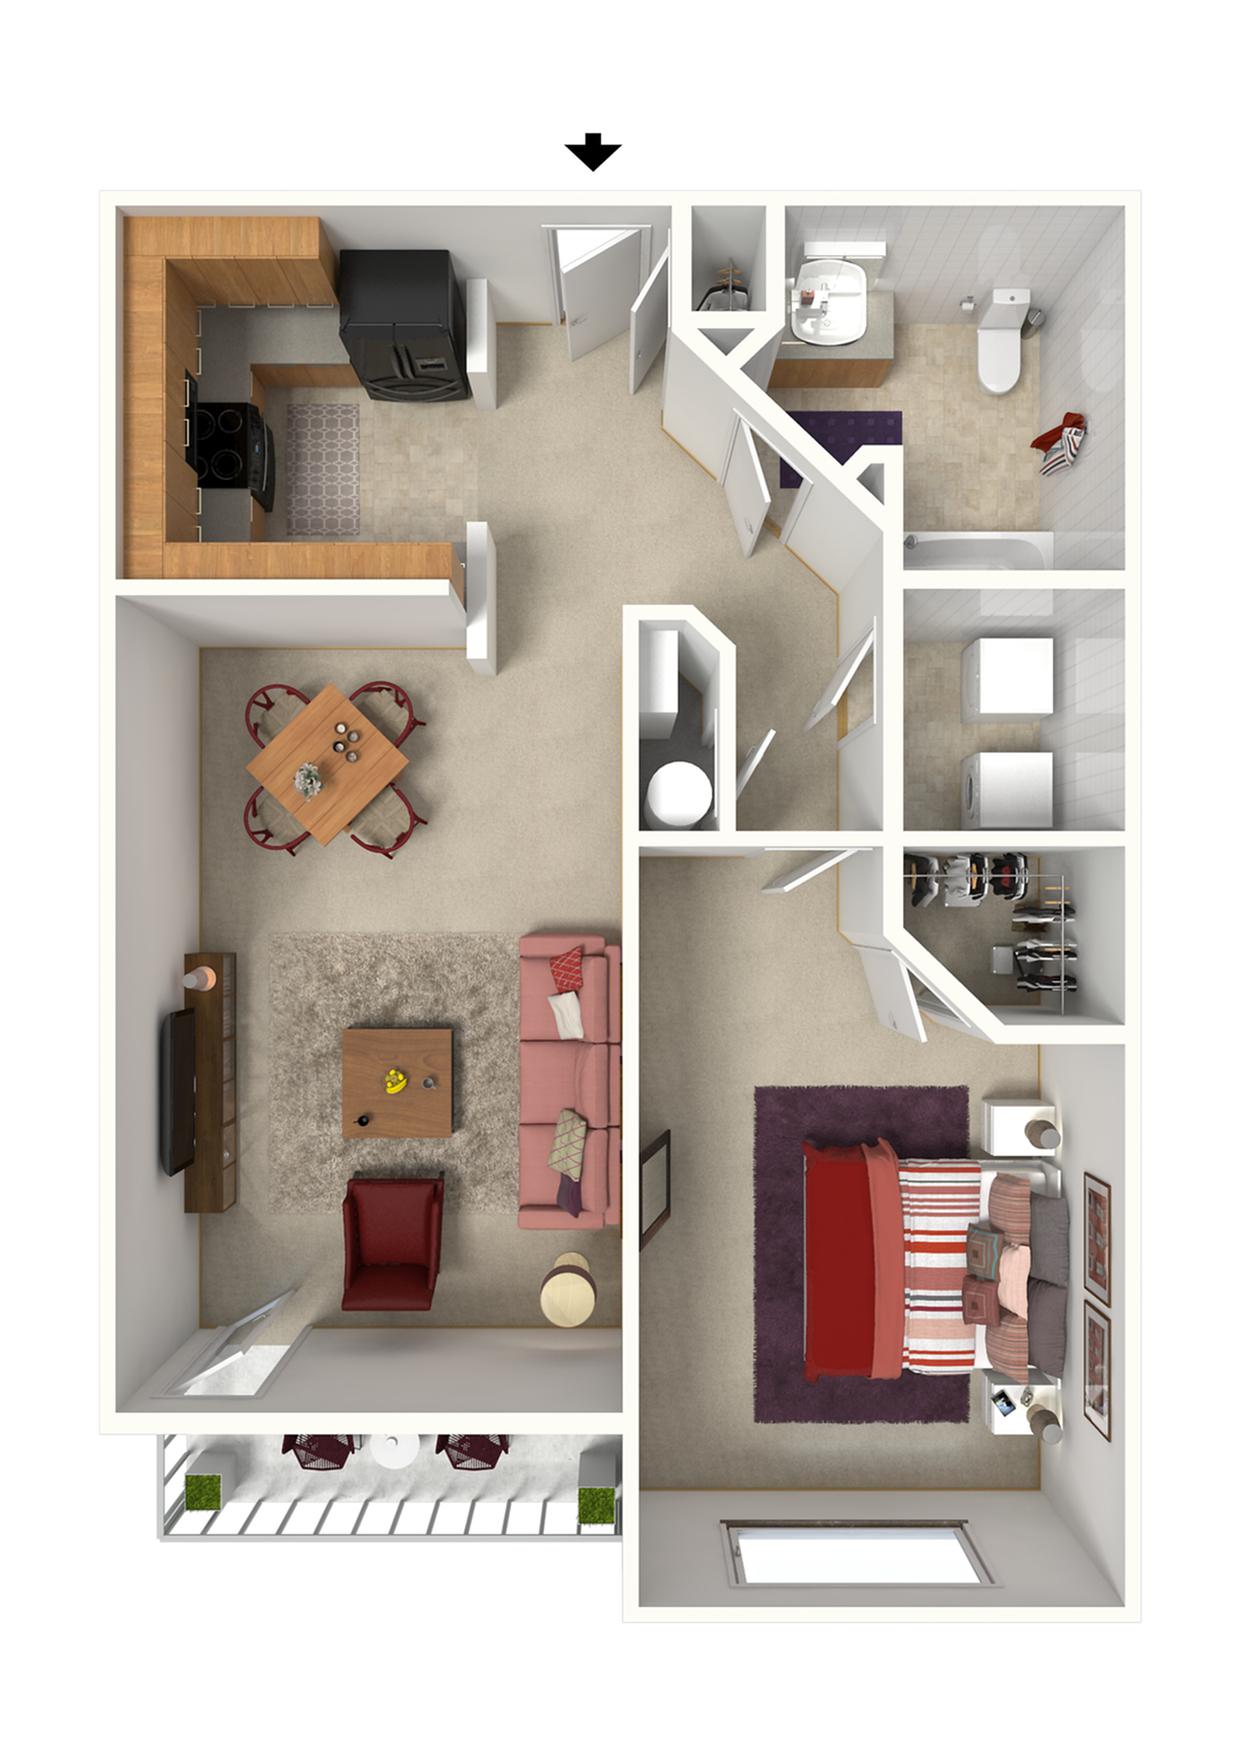 Terrace - x1x - 768 SqFt.